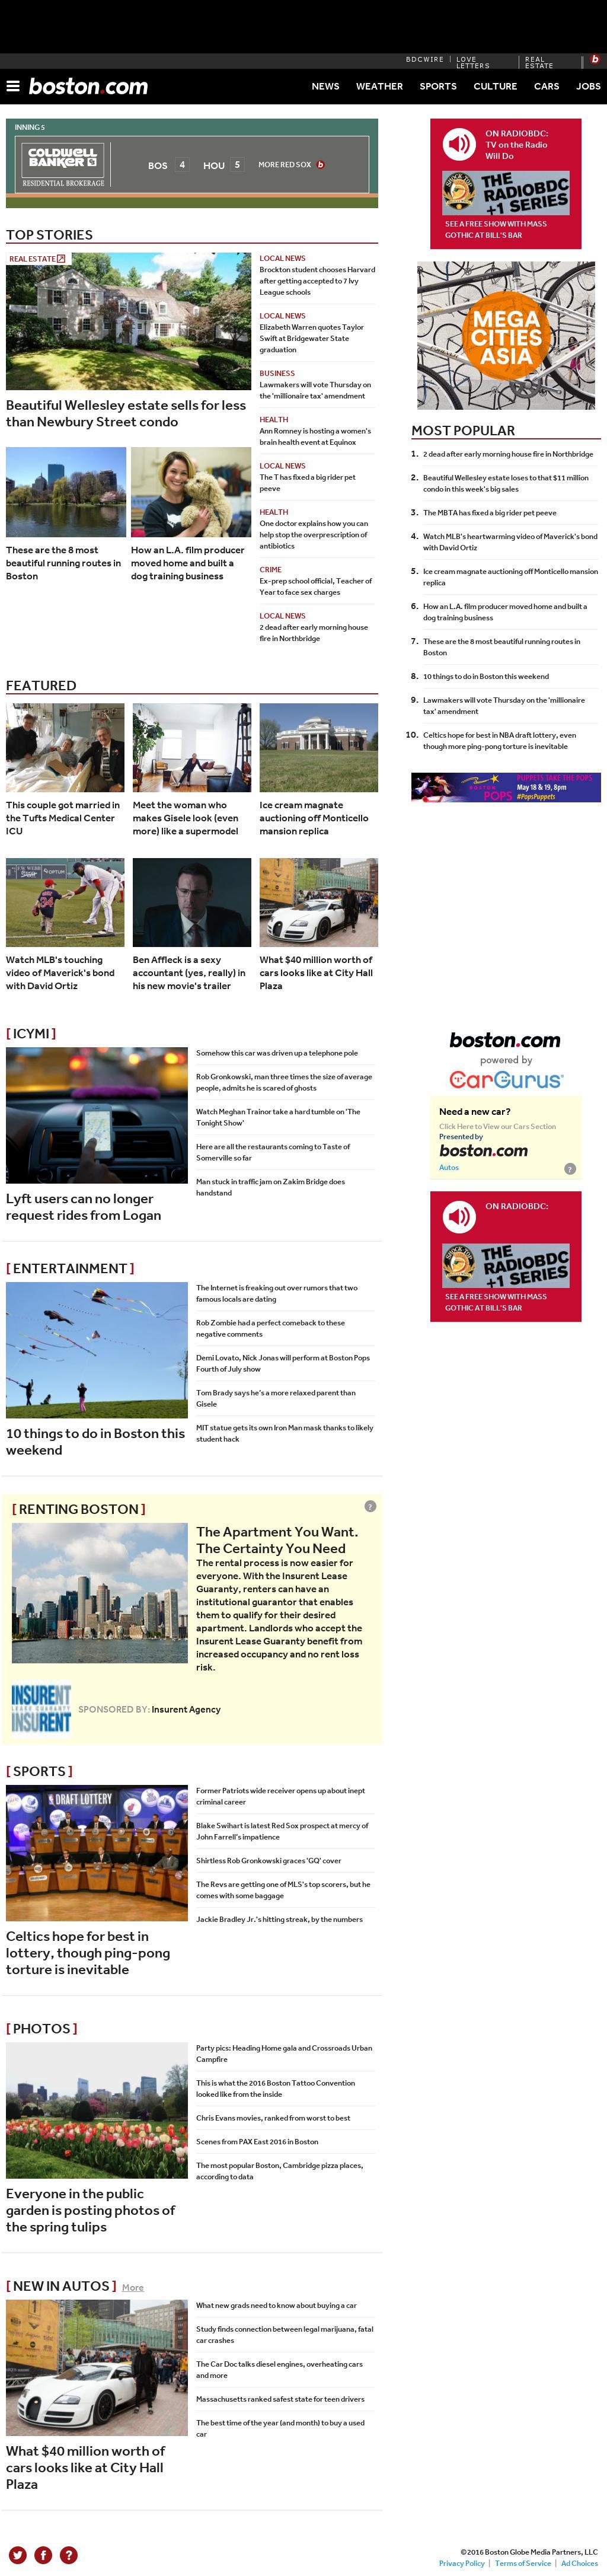 Boston.com at Saturday May 14, 2016, 7:01 p.m. UTC